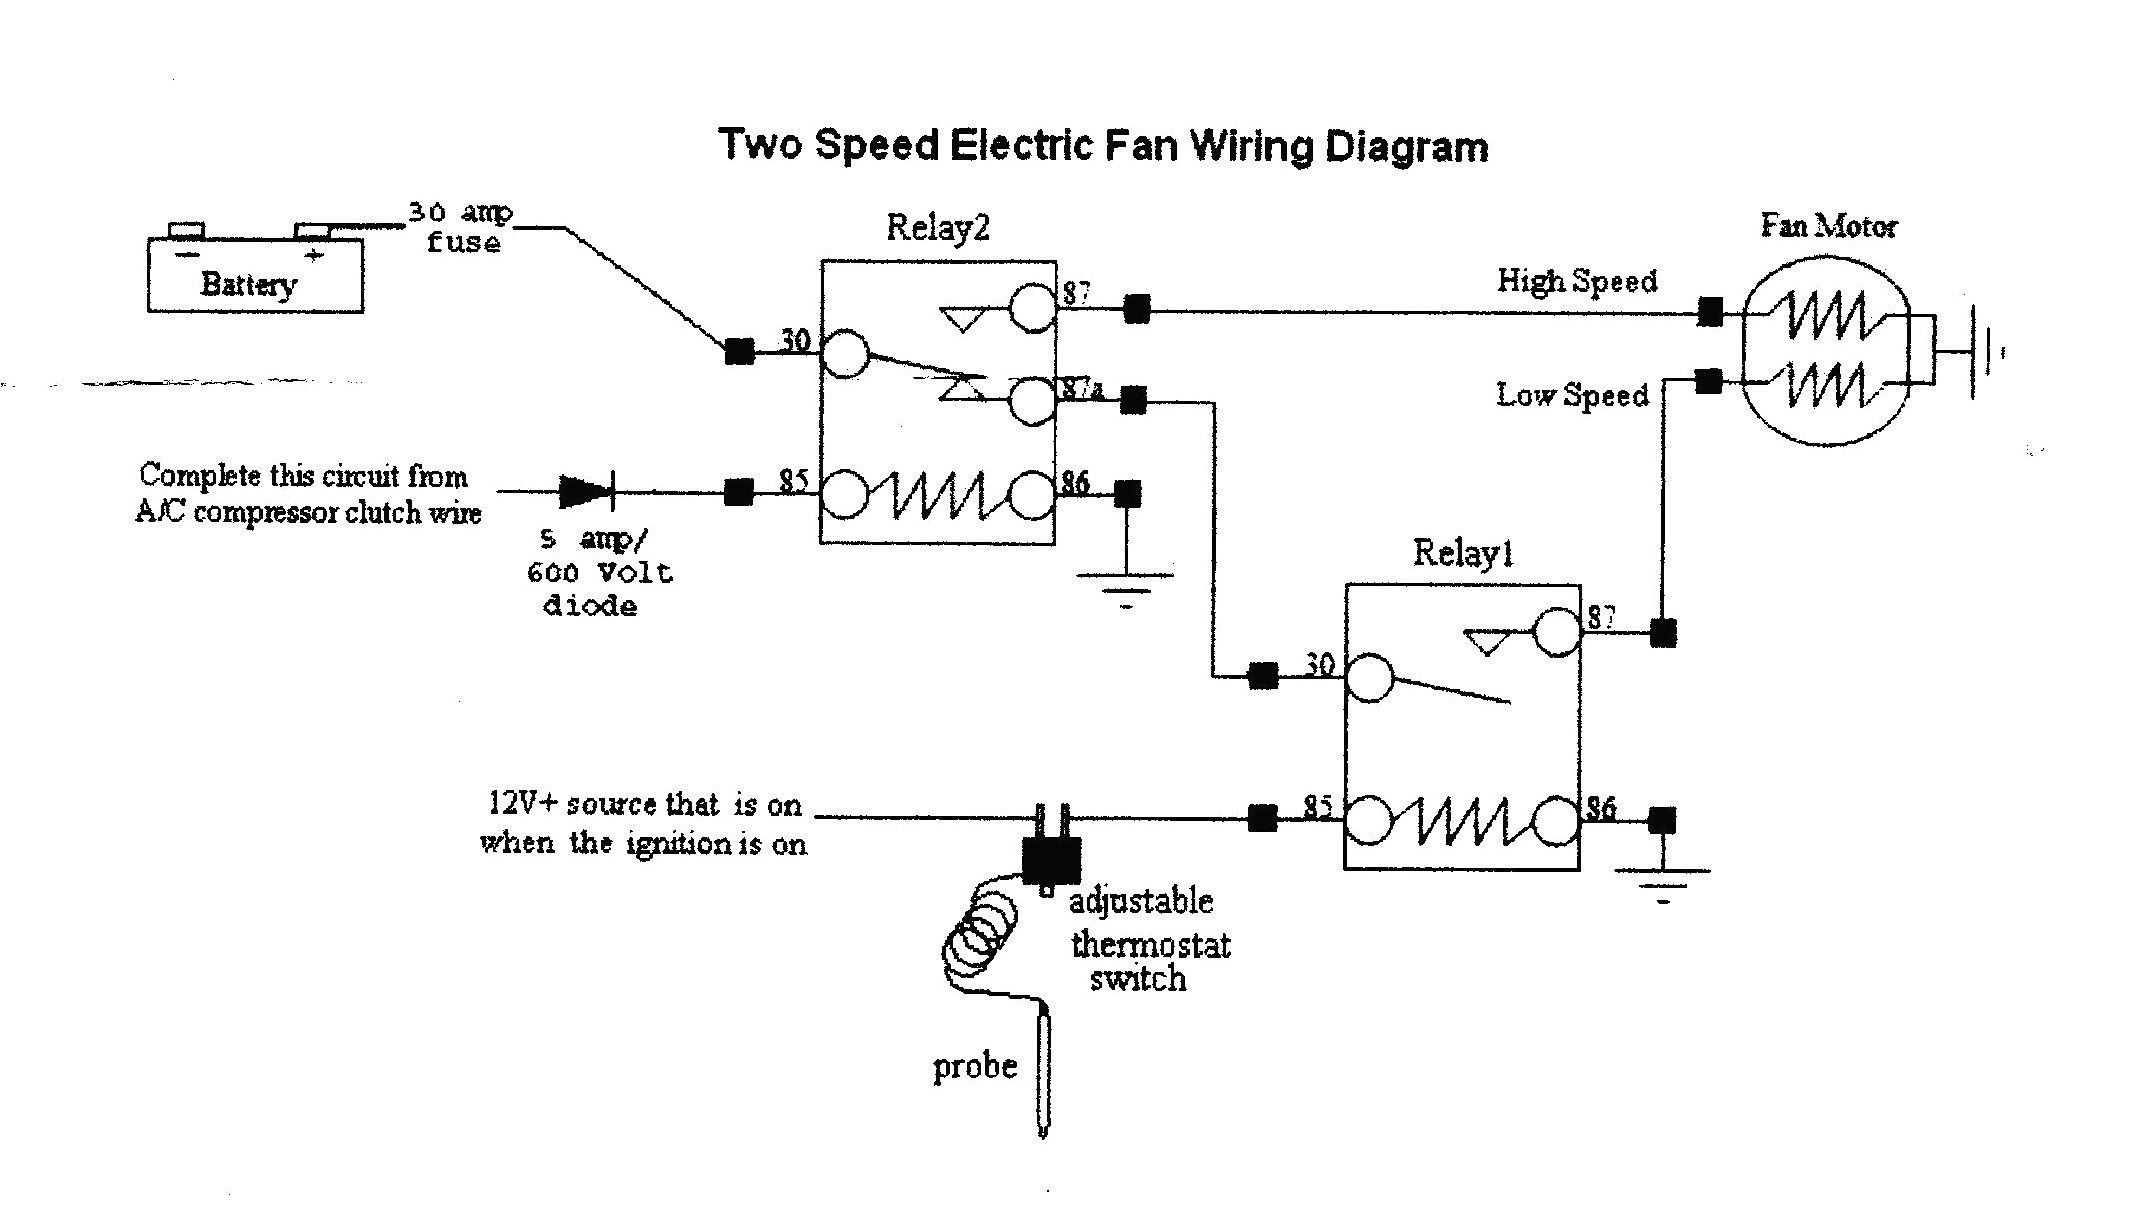 Fuel Pump Wiring Diagram Unique Wiring Diagram for Electric Fan Relay Diagram Of Fuel Pump Wiring Diagram